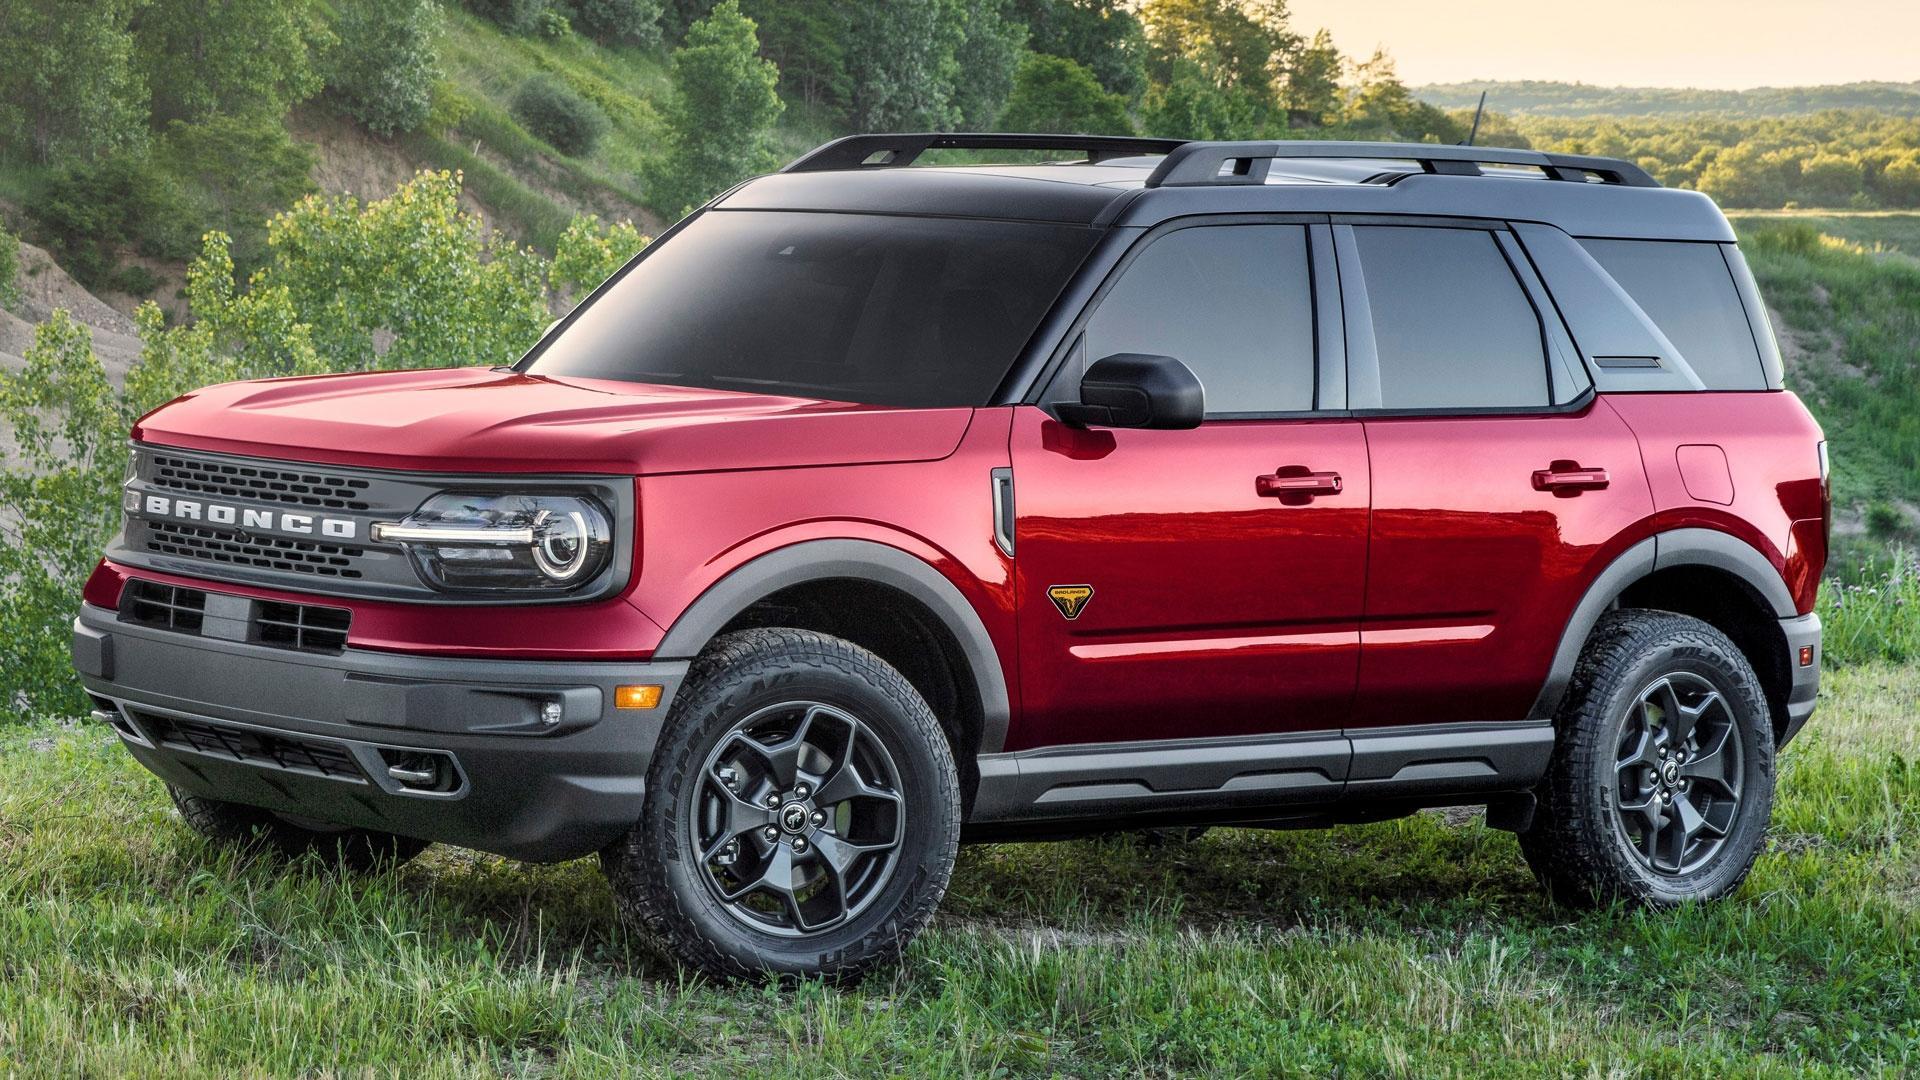 2021 Ford Bronco Sport & 2021 Volkswagen ID.4